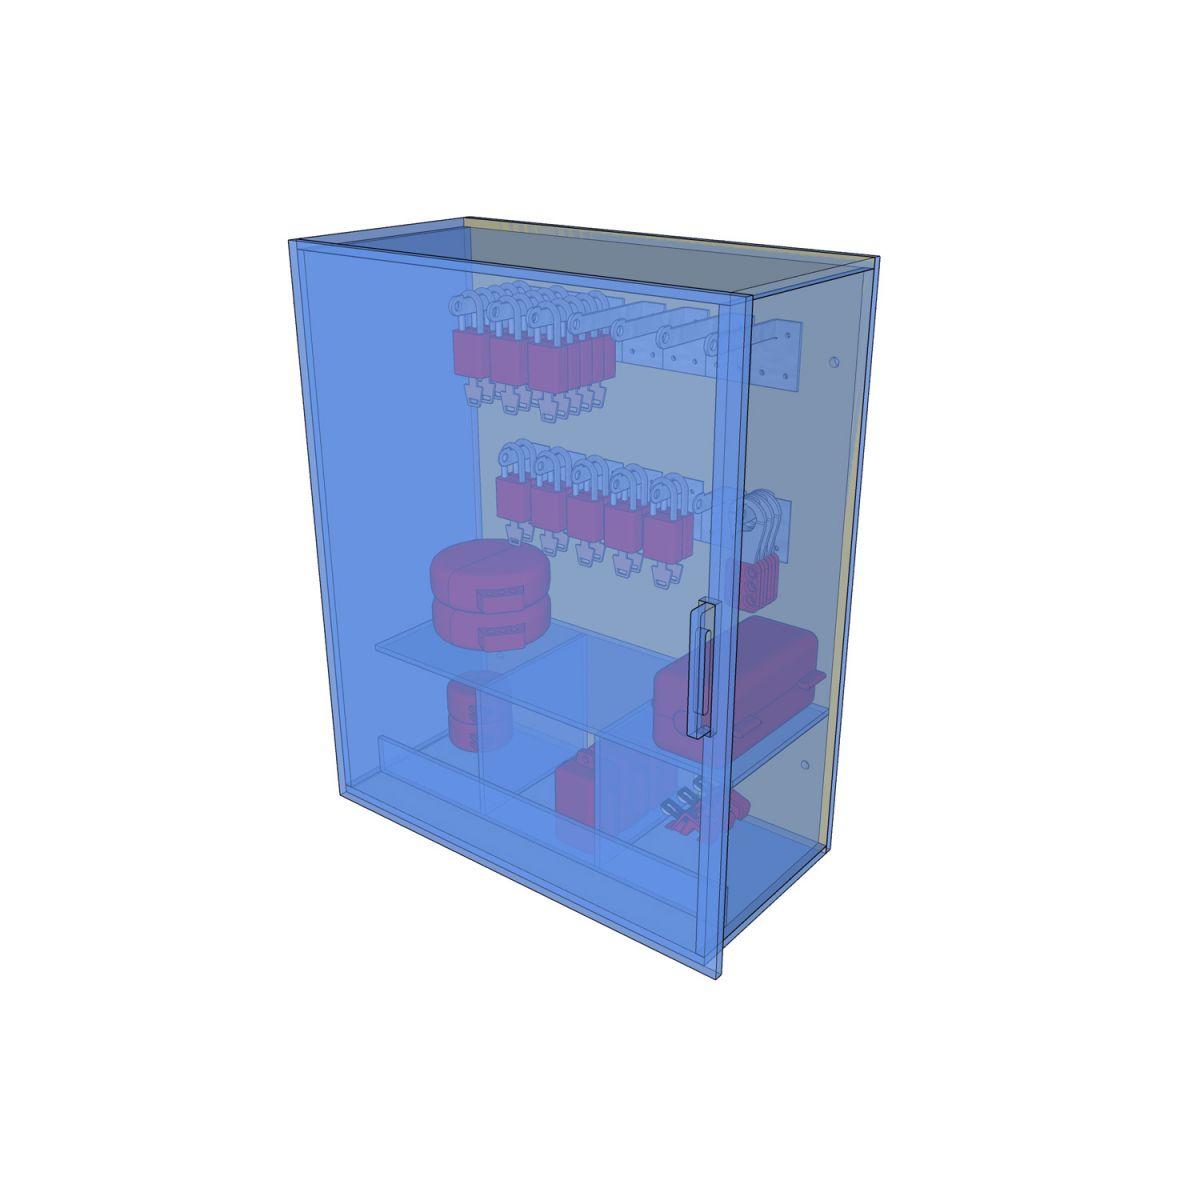 Postes de cadenassage en polycarbonate   PLC-1824 2